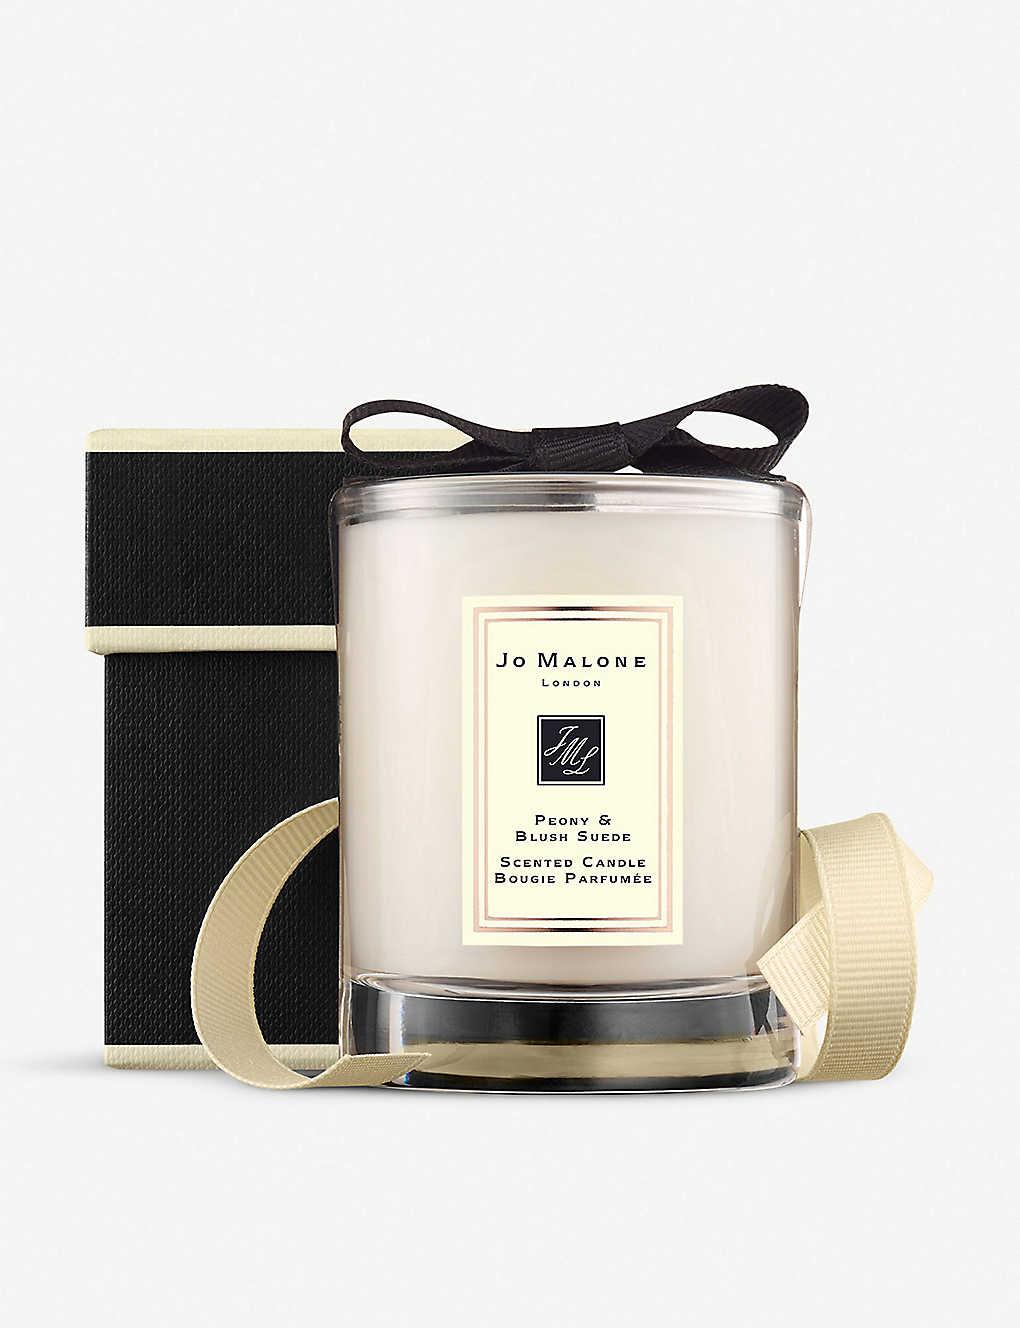 JoMalone 祖玛珑 牡丹与胭红麂绒旅行香氛蜡烛 - 60g